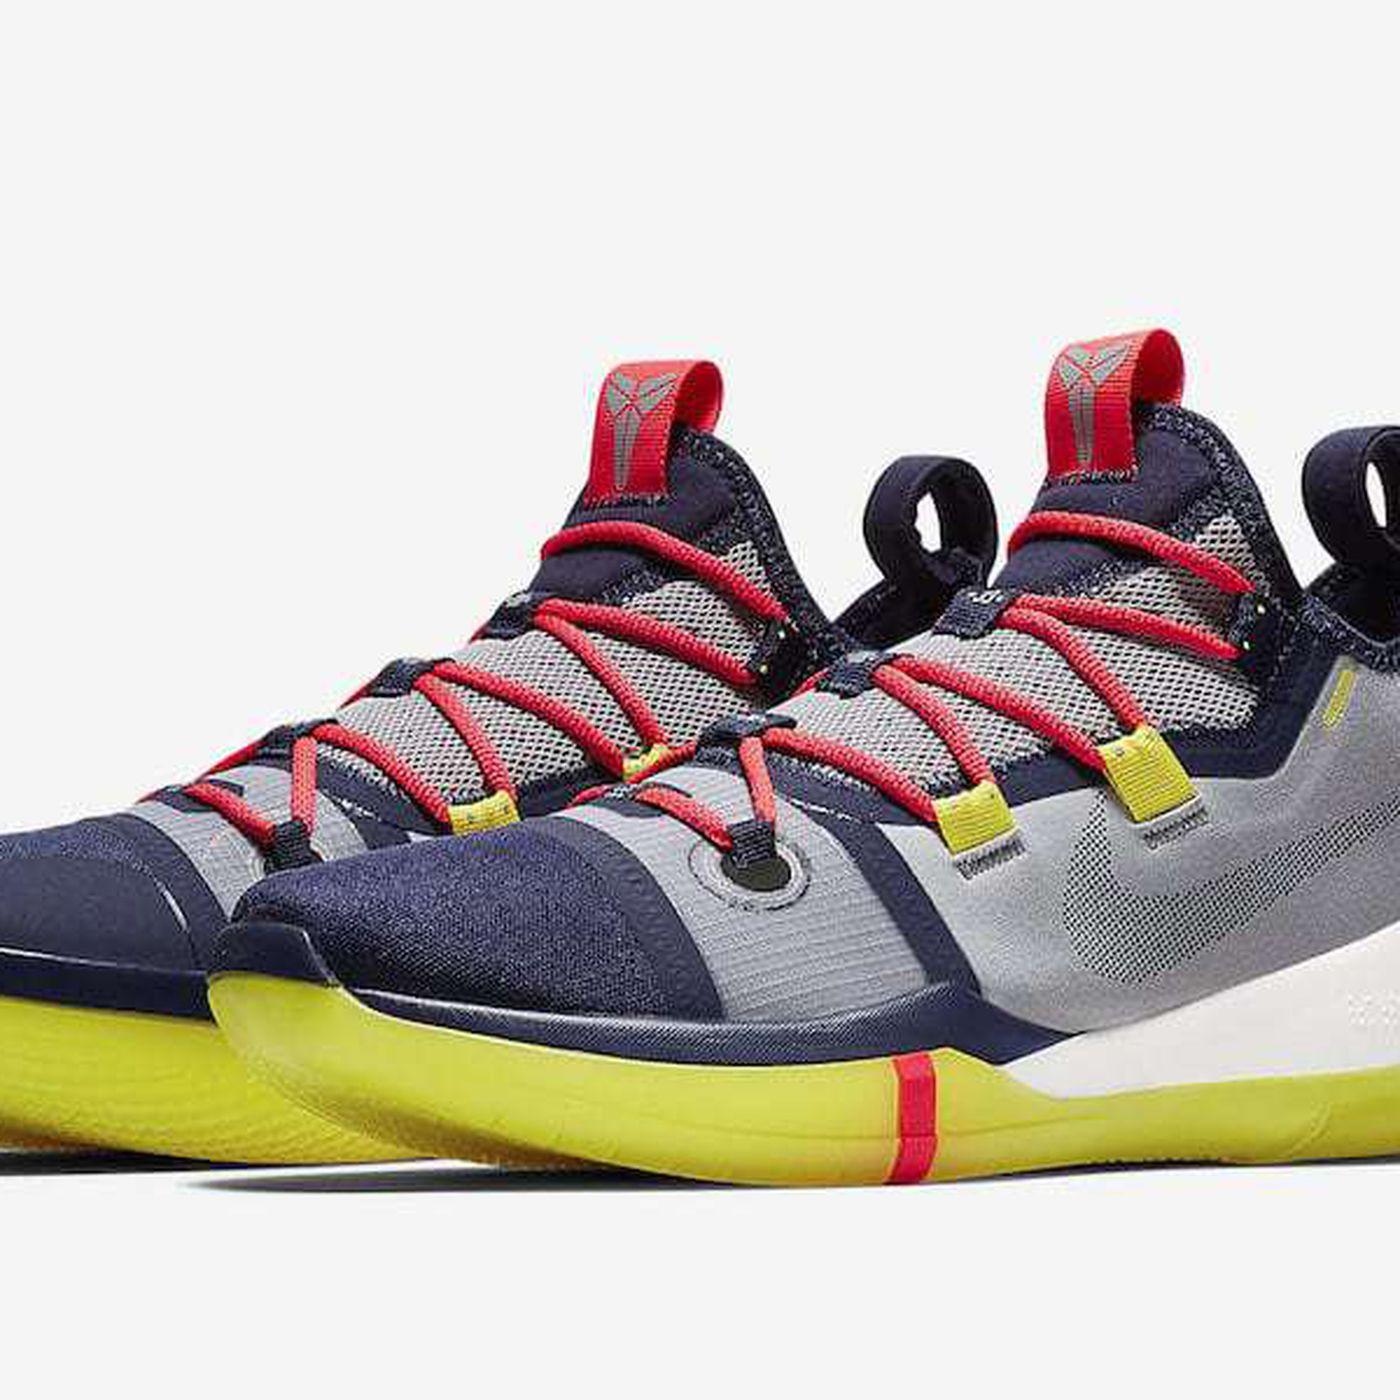 dc87d3cbbf970 Nike s new Kobe A.D. signature shoe has dropped - SBNation.com